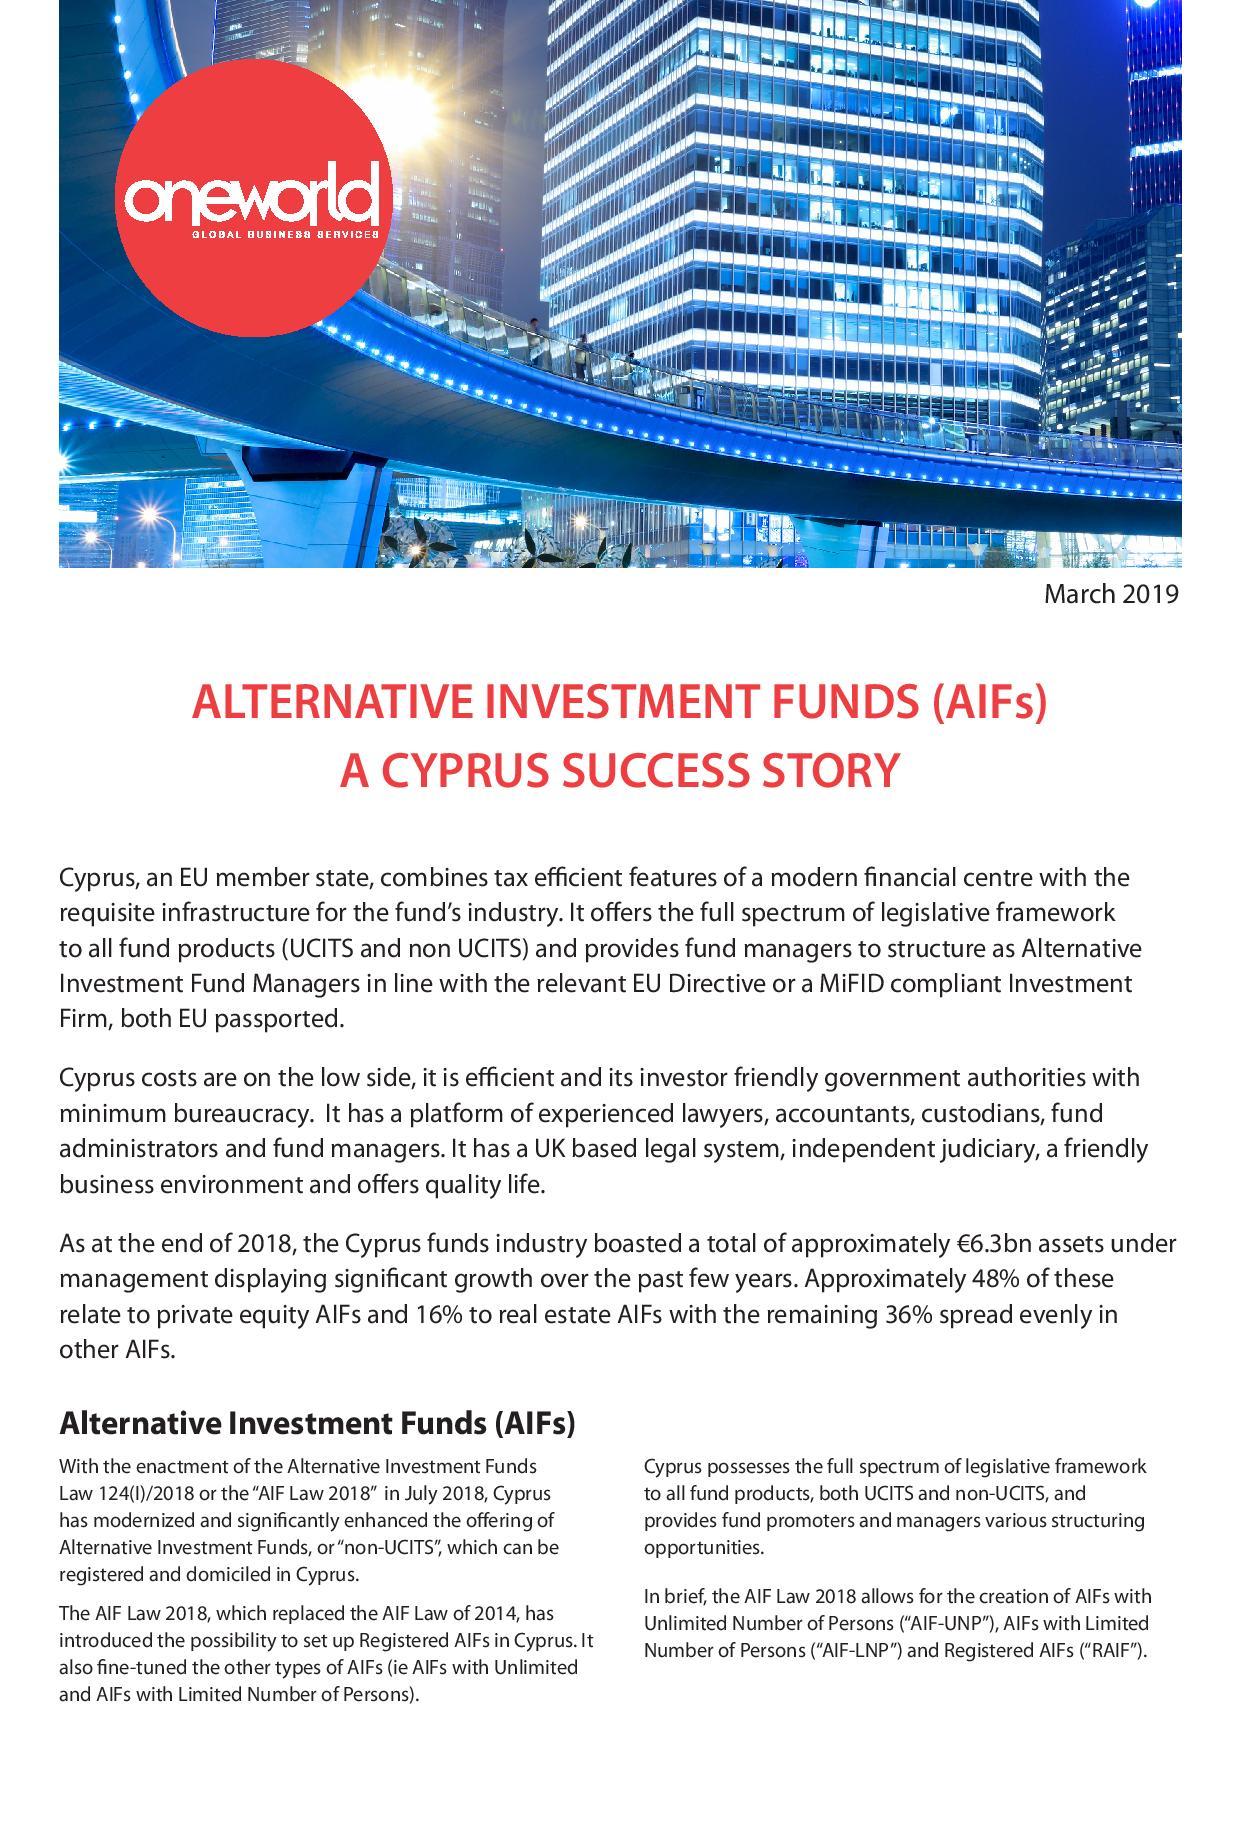 Oneworld Ltd: Alternative Investment Funds (AIFs) - A Cyprus Success Story